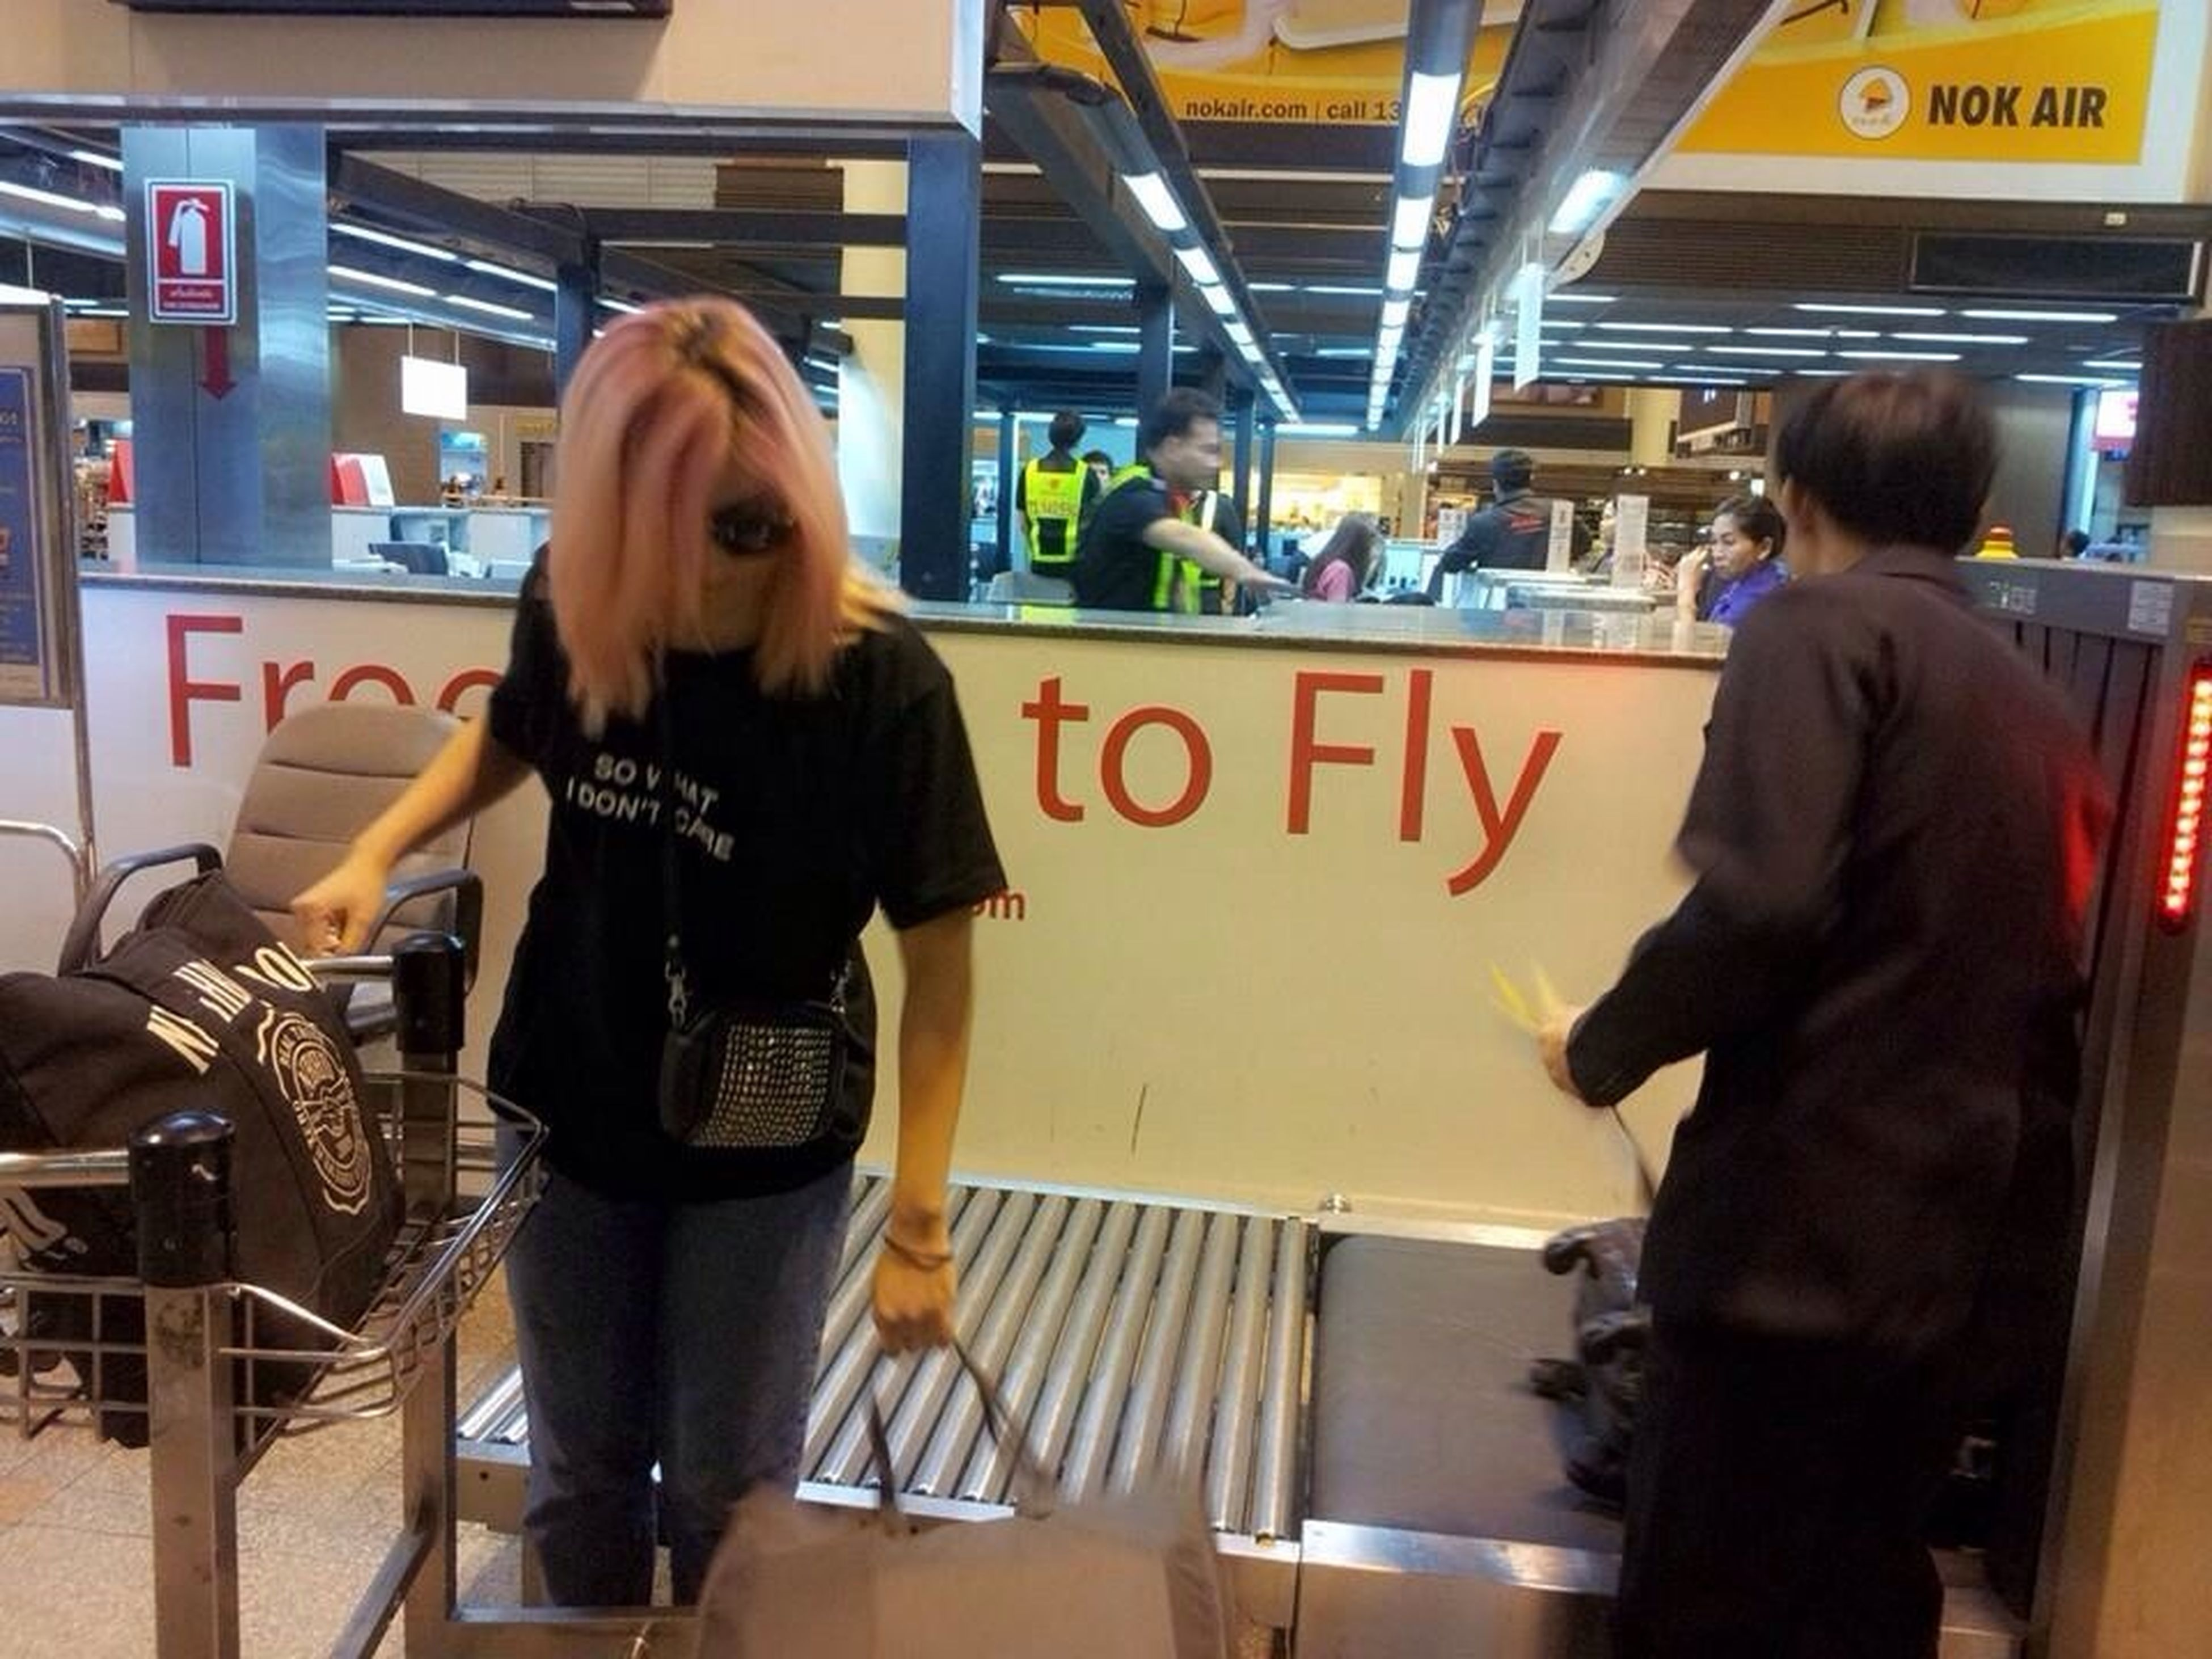 TheCreo to fly~. ✈️? - รูปเหมาะ! อยู่ถูกที่ถูกทาง เปงโค๊ดเบาๆ ว่าต้องบินล่ะนะ!!#FotoRus. On A Holiday Let's Fly~ On The Run Life Go On